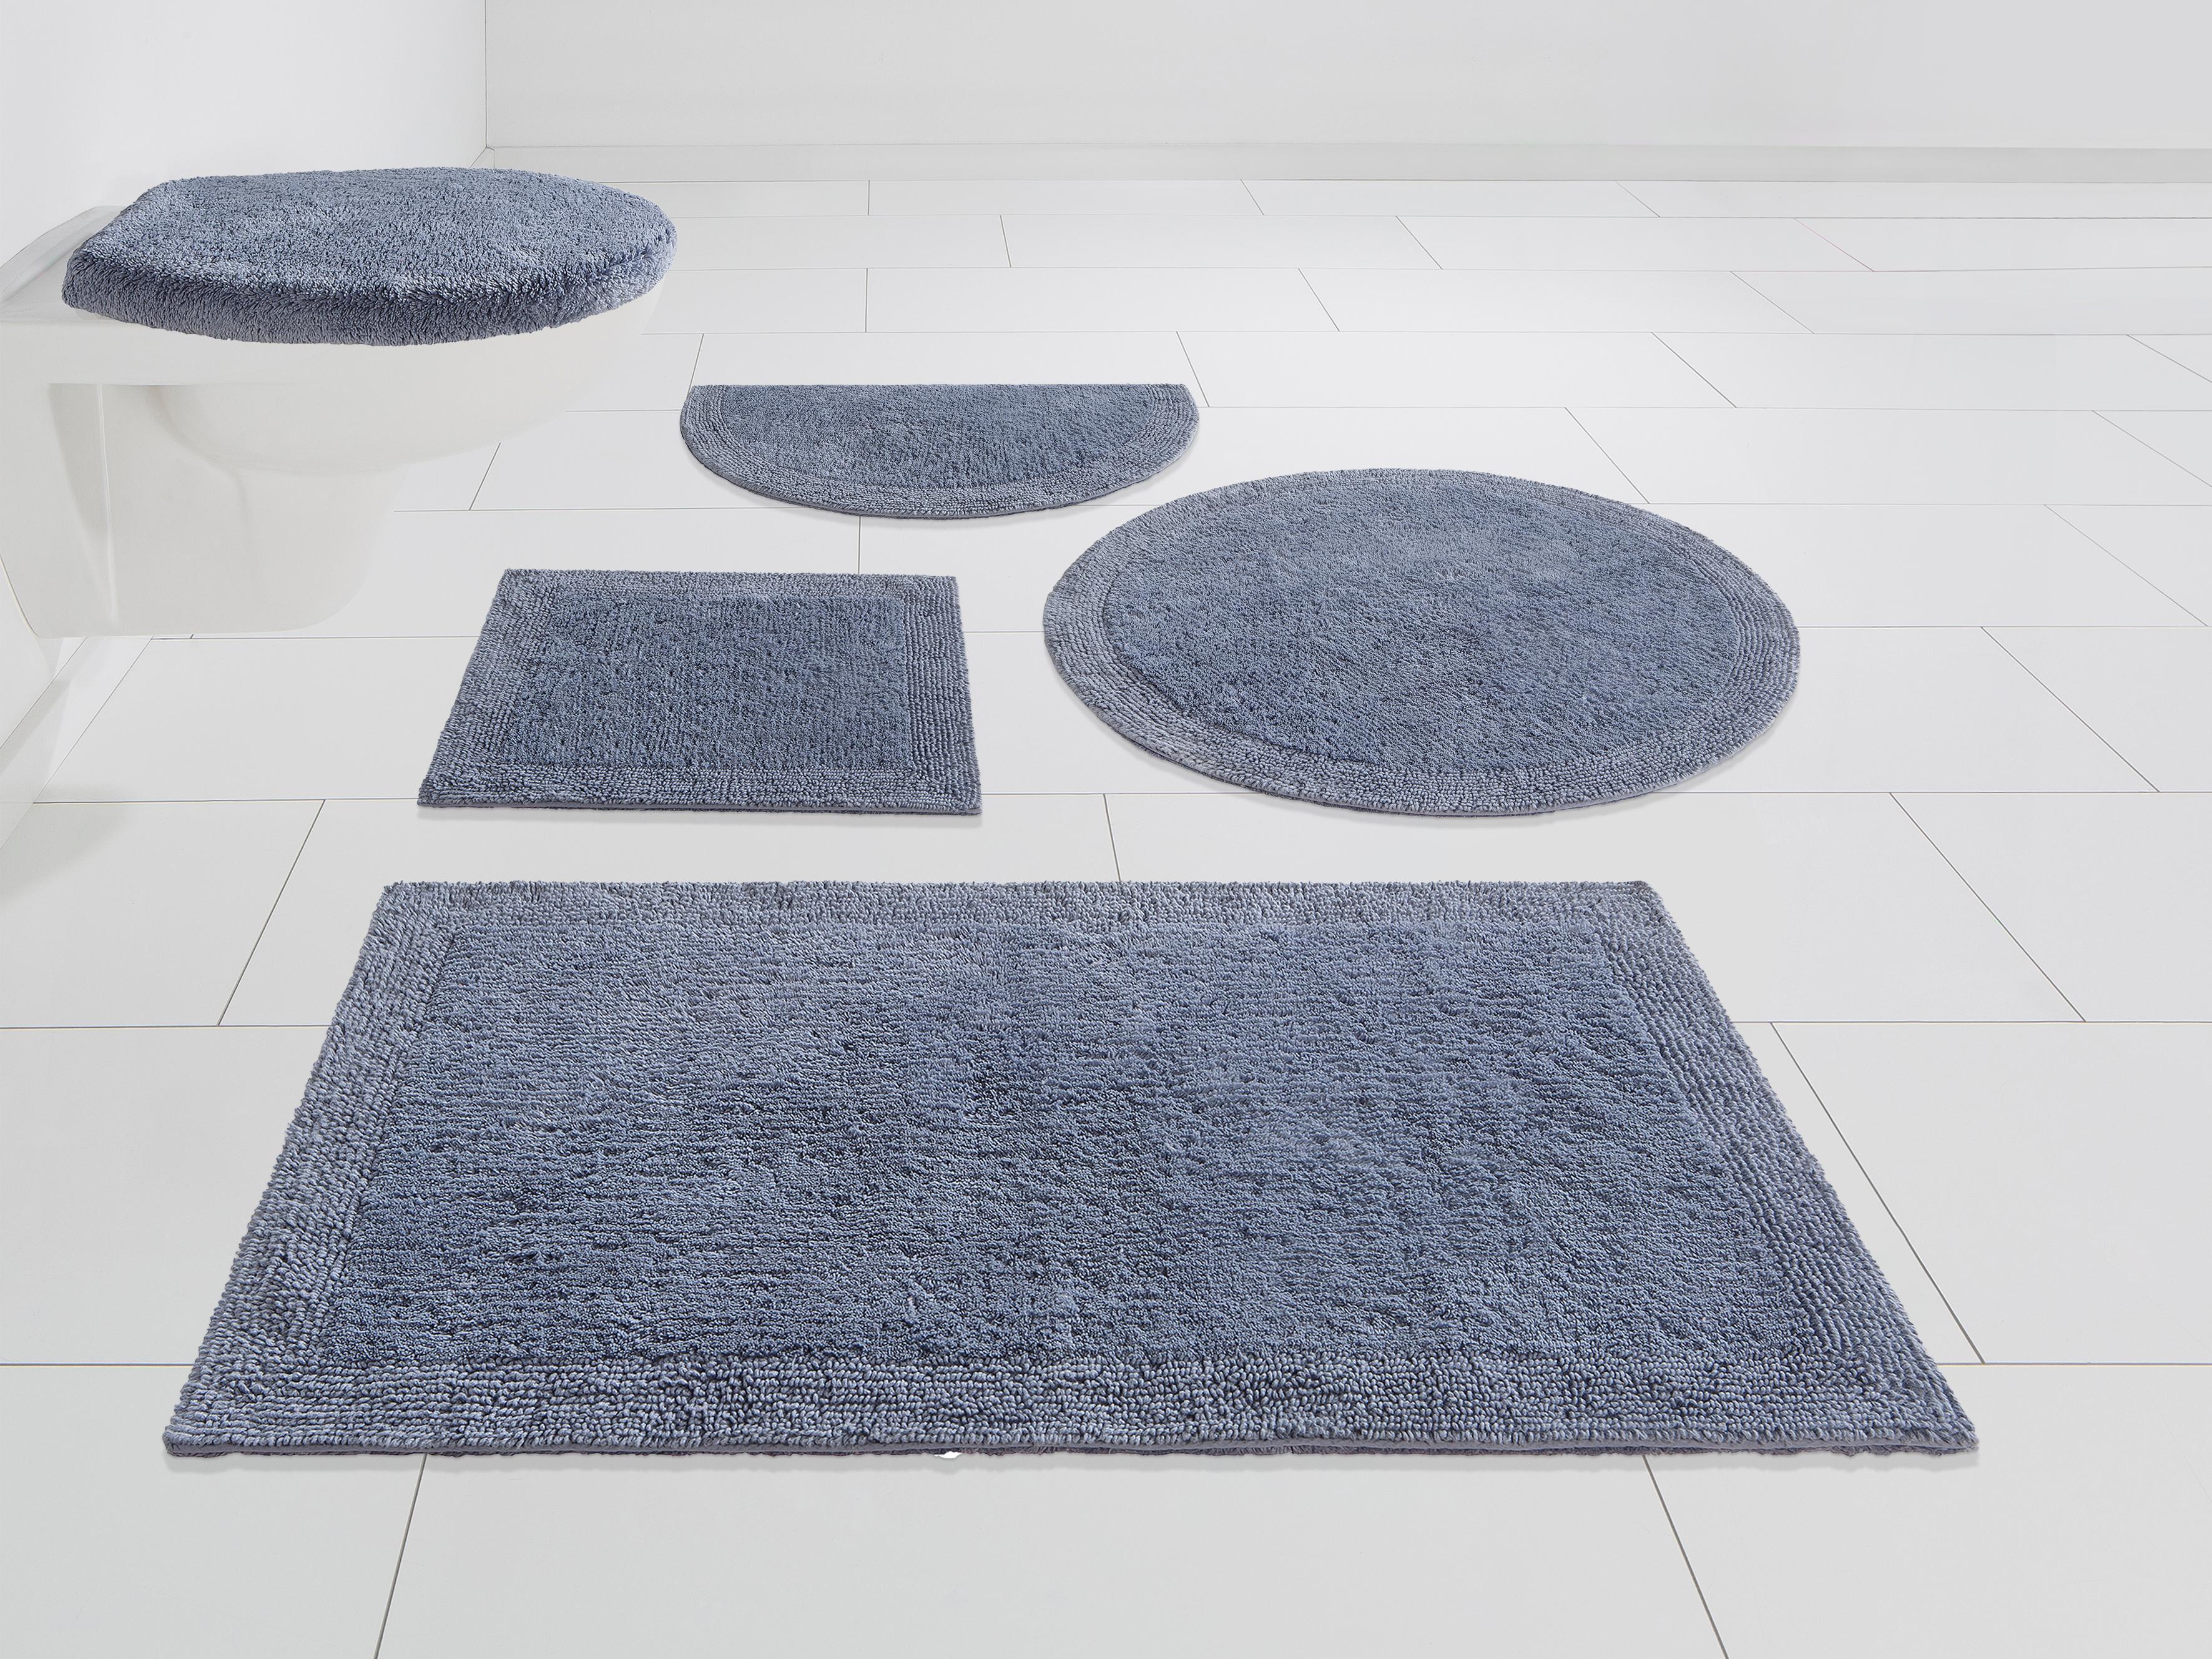 Image of Badematte »Kapra«, Home affaire, Höhe 10 mm, beidseitig nutzbar